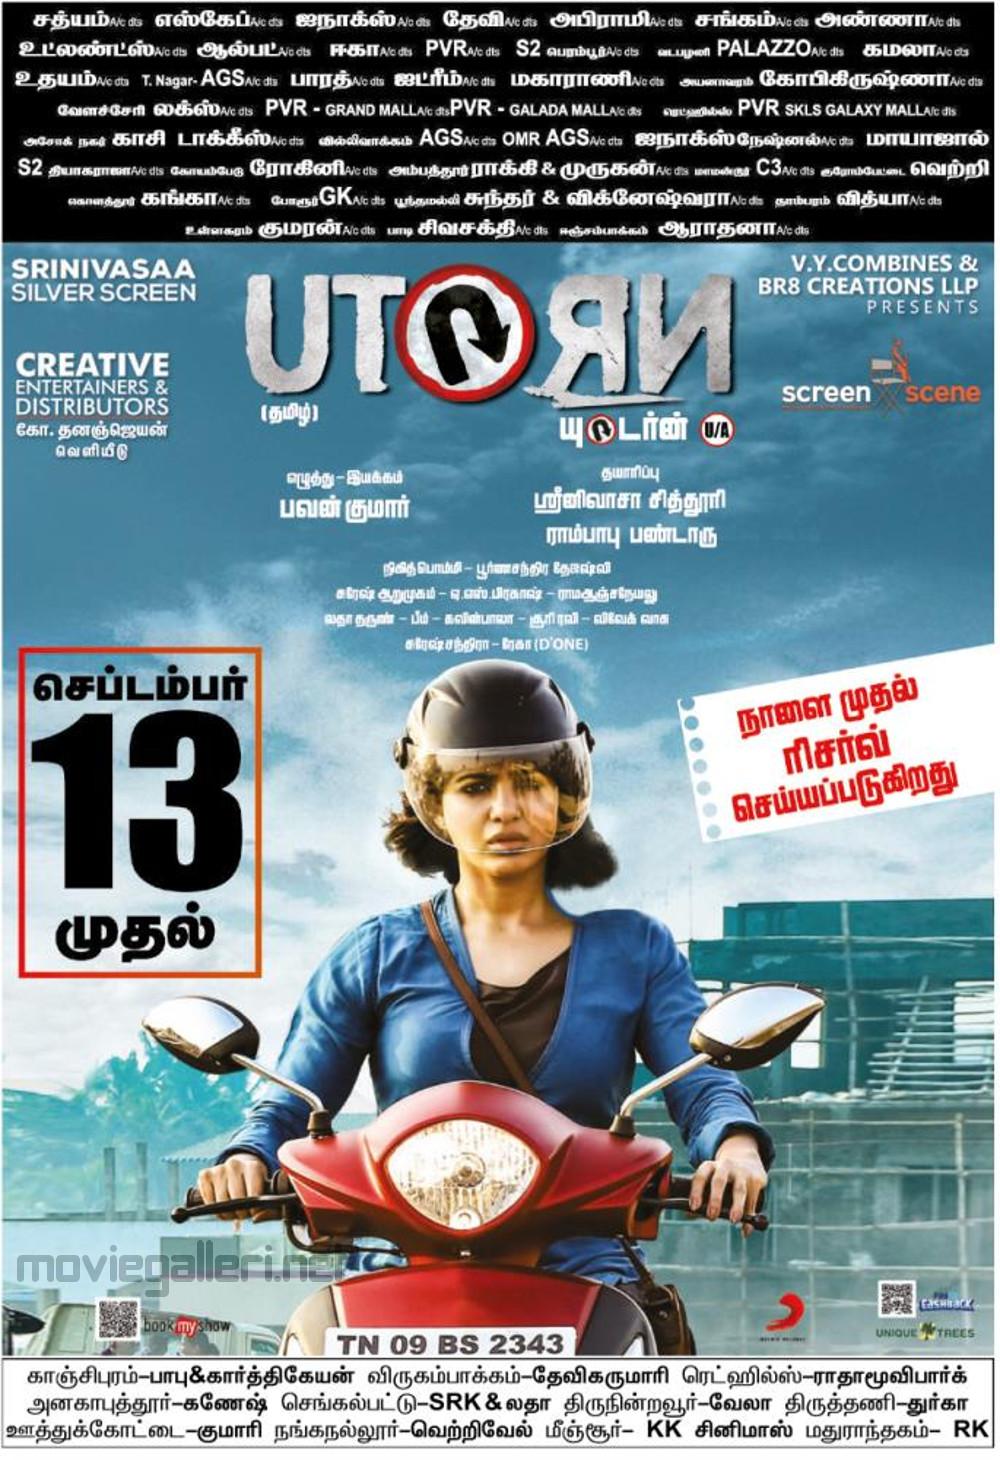 Samantha U Turn Movie 3 Days to Go Poster